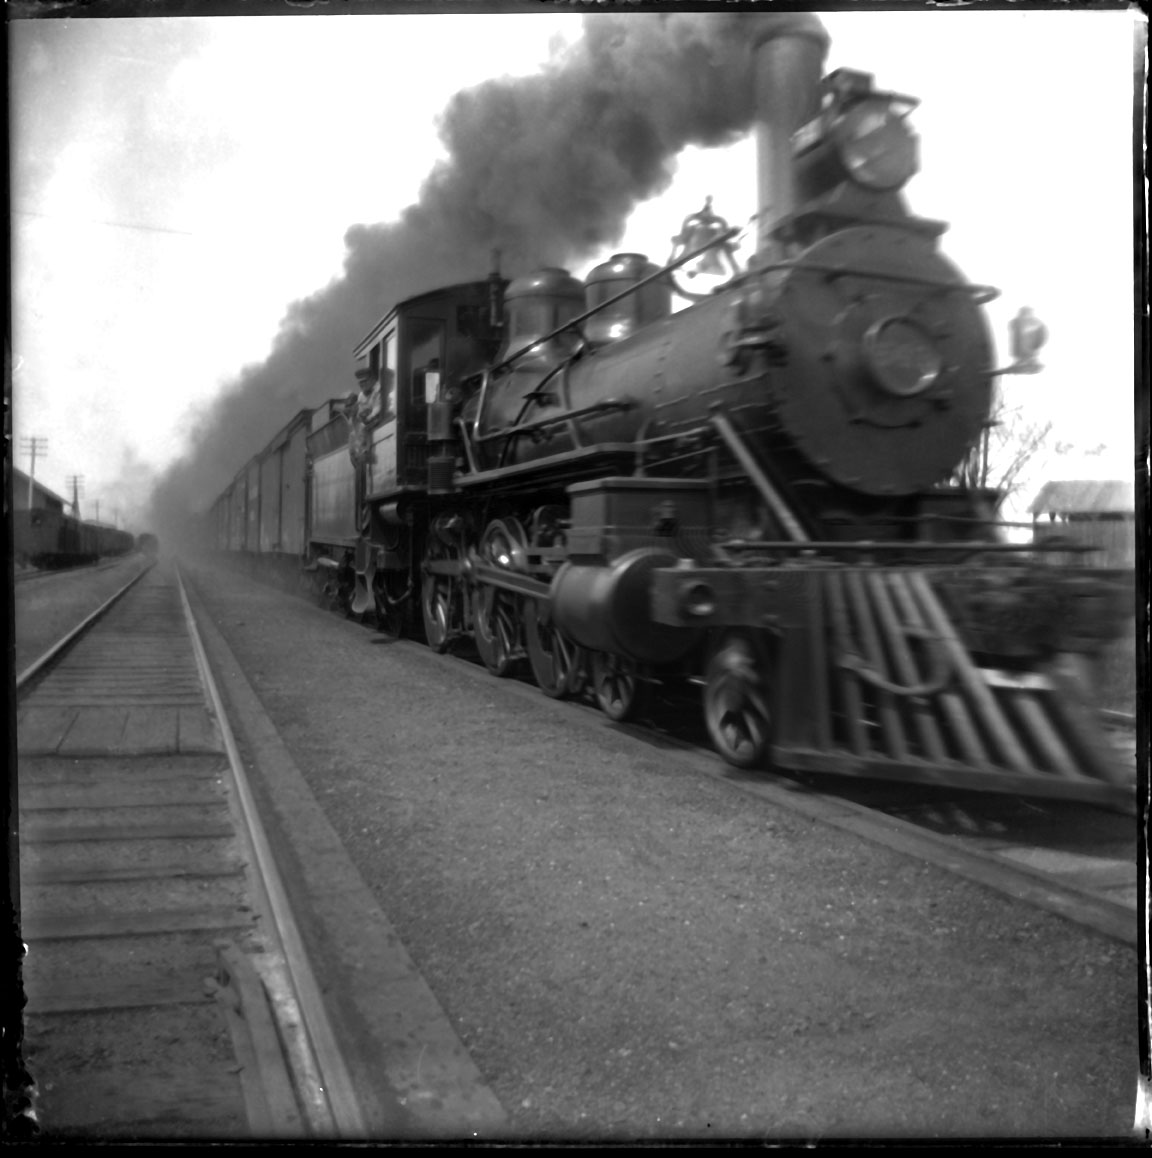 Locomotive with Smoke c.1920 from original 4x5 glass plate negative